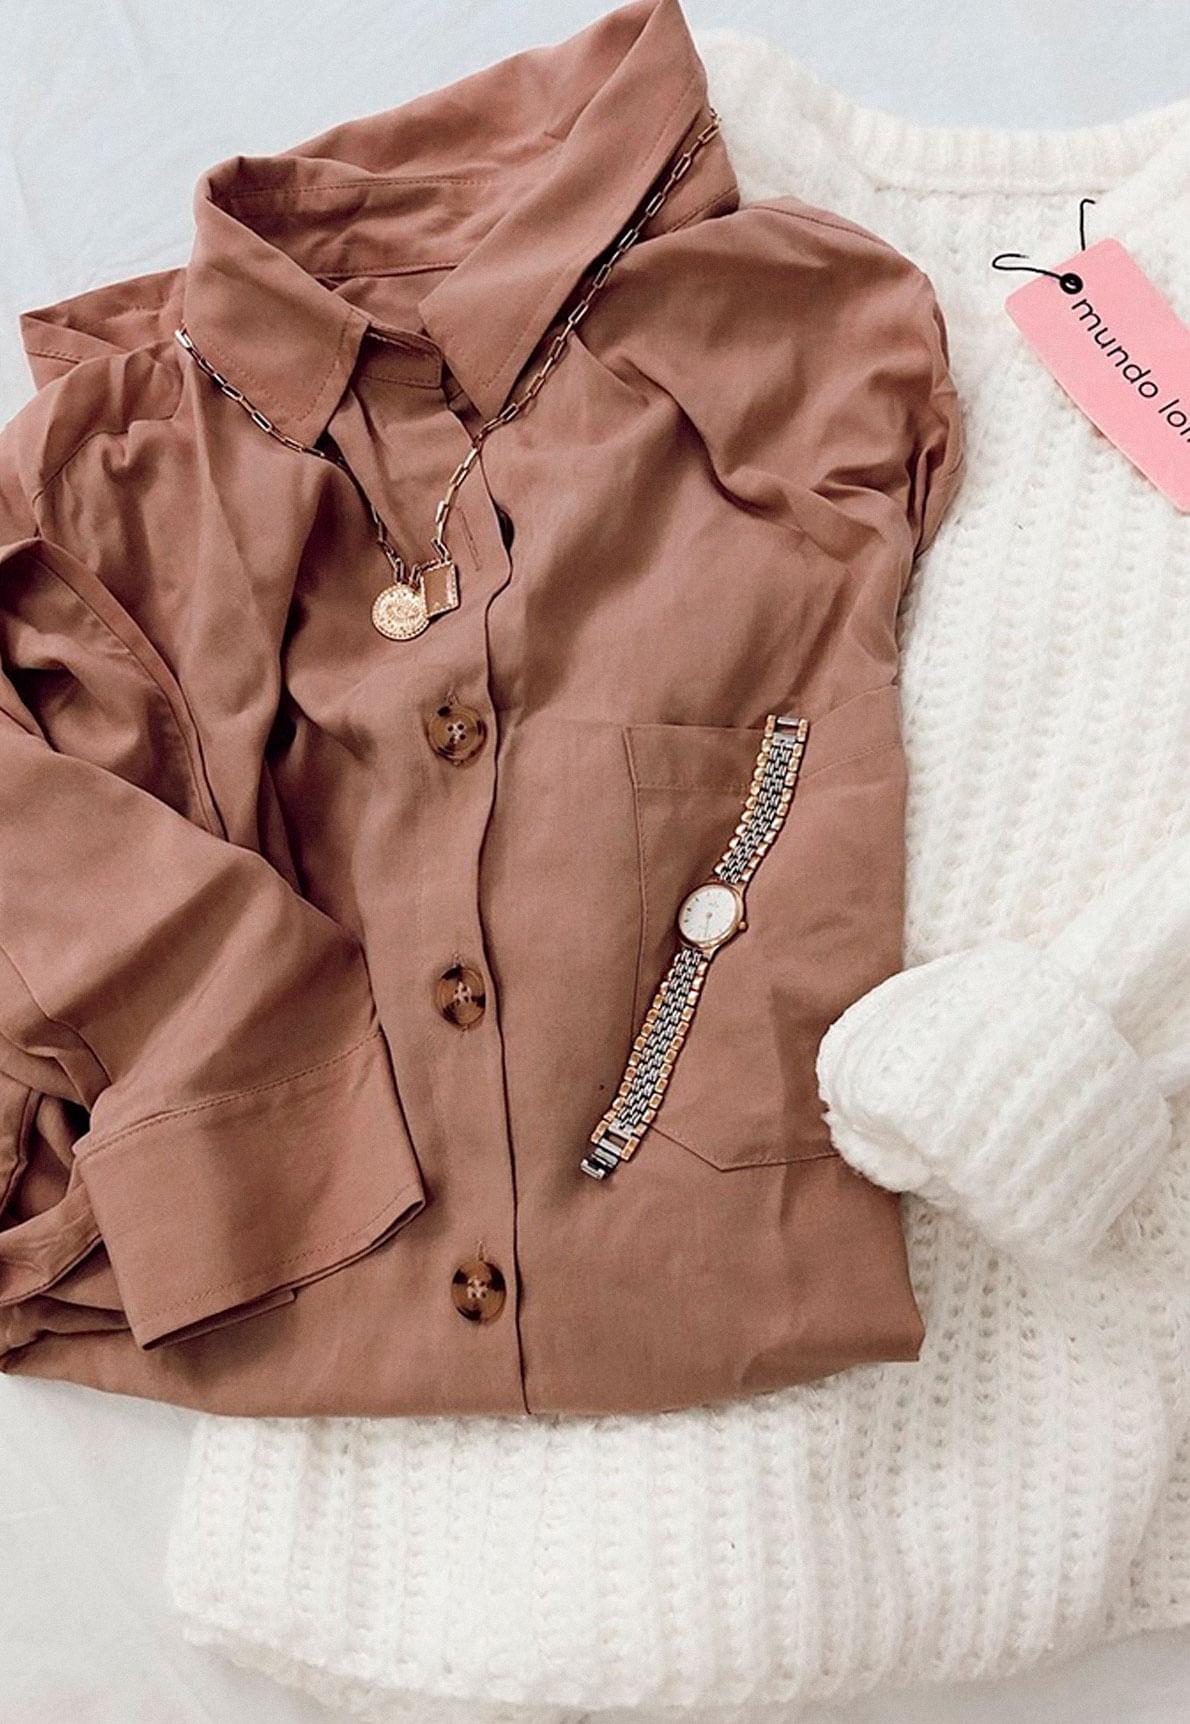 29429-chemise-rose-karolyn-mundo-lolita-09